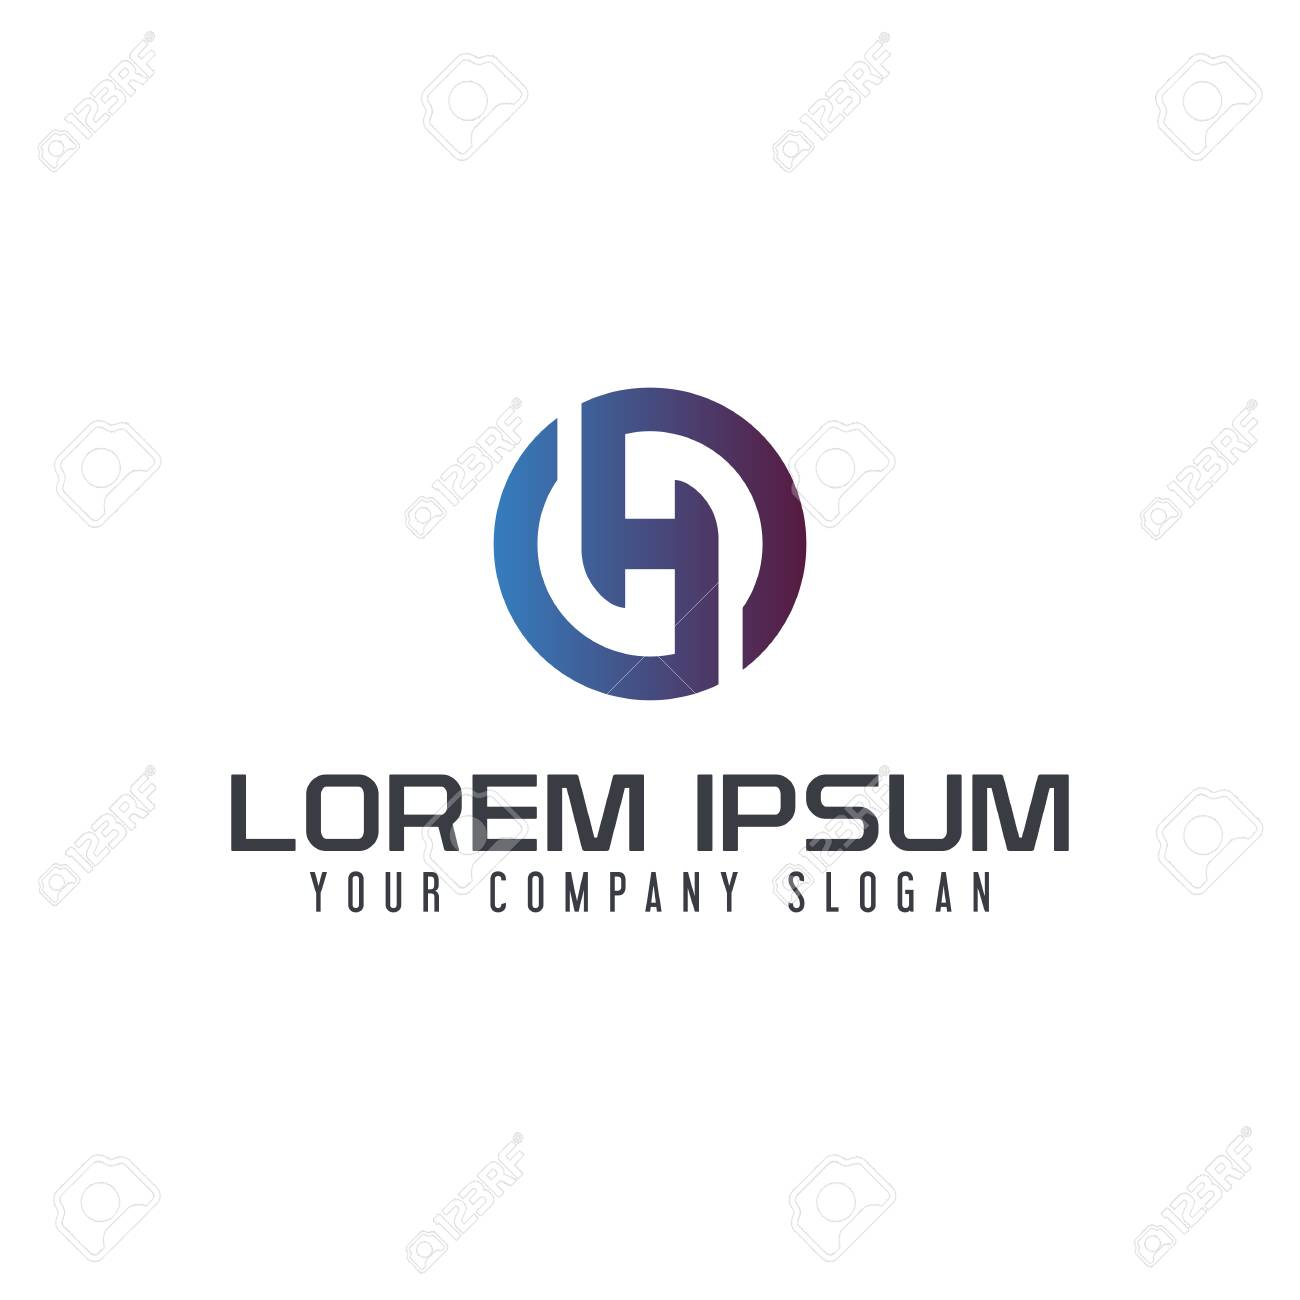 Letter H logo design concept template - 88417486